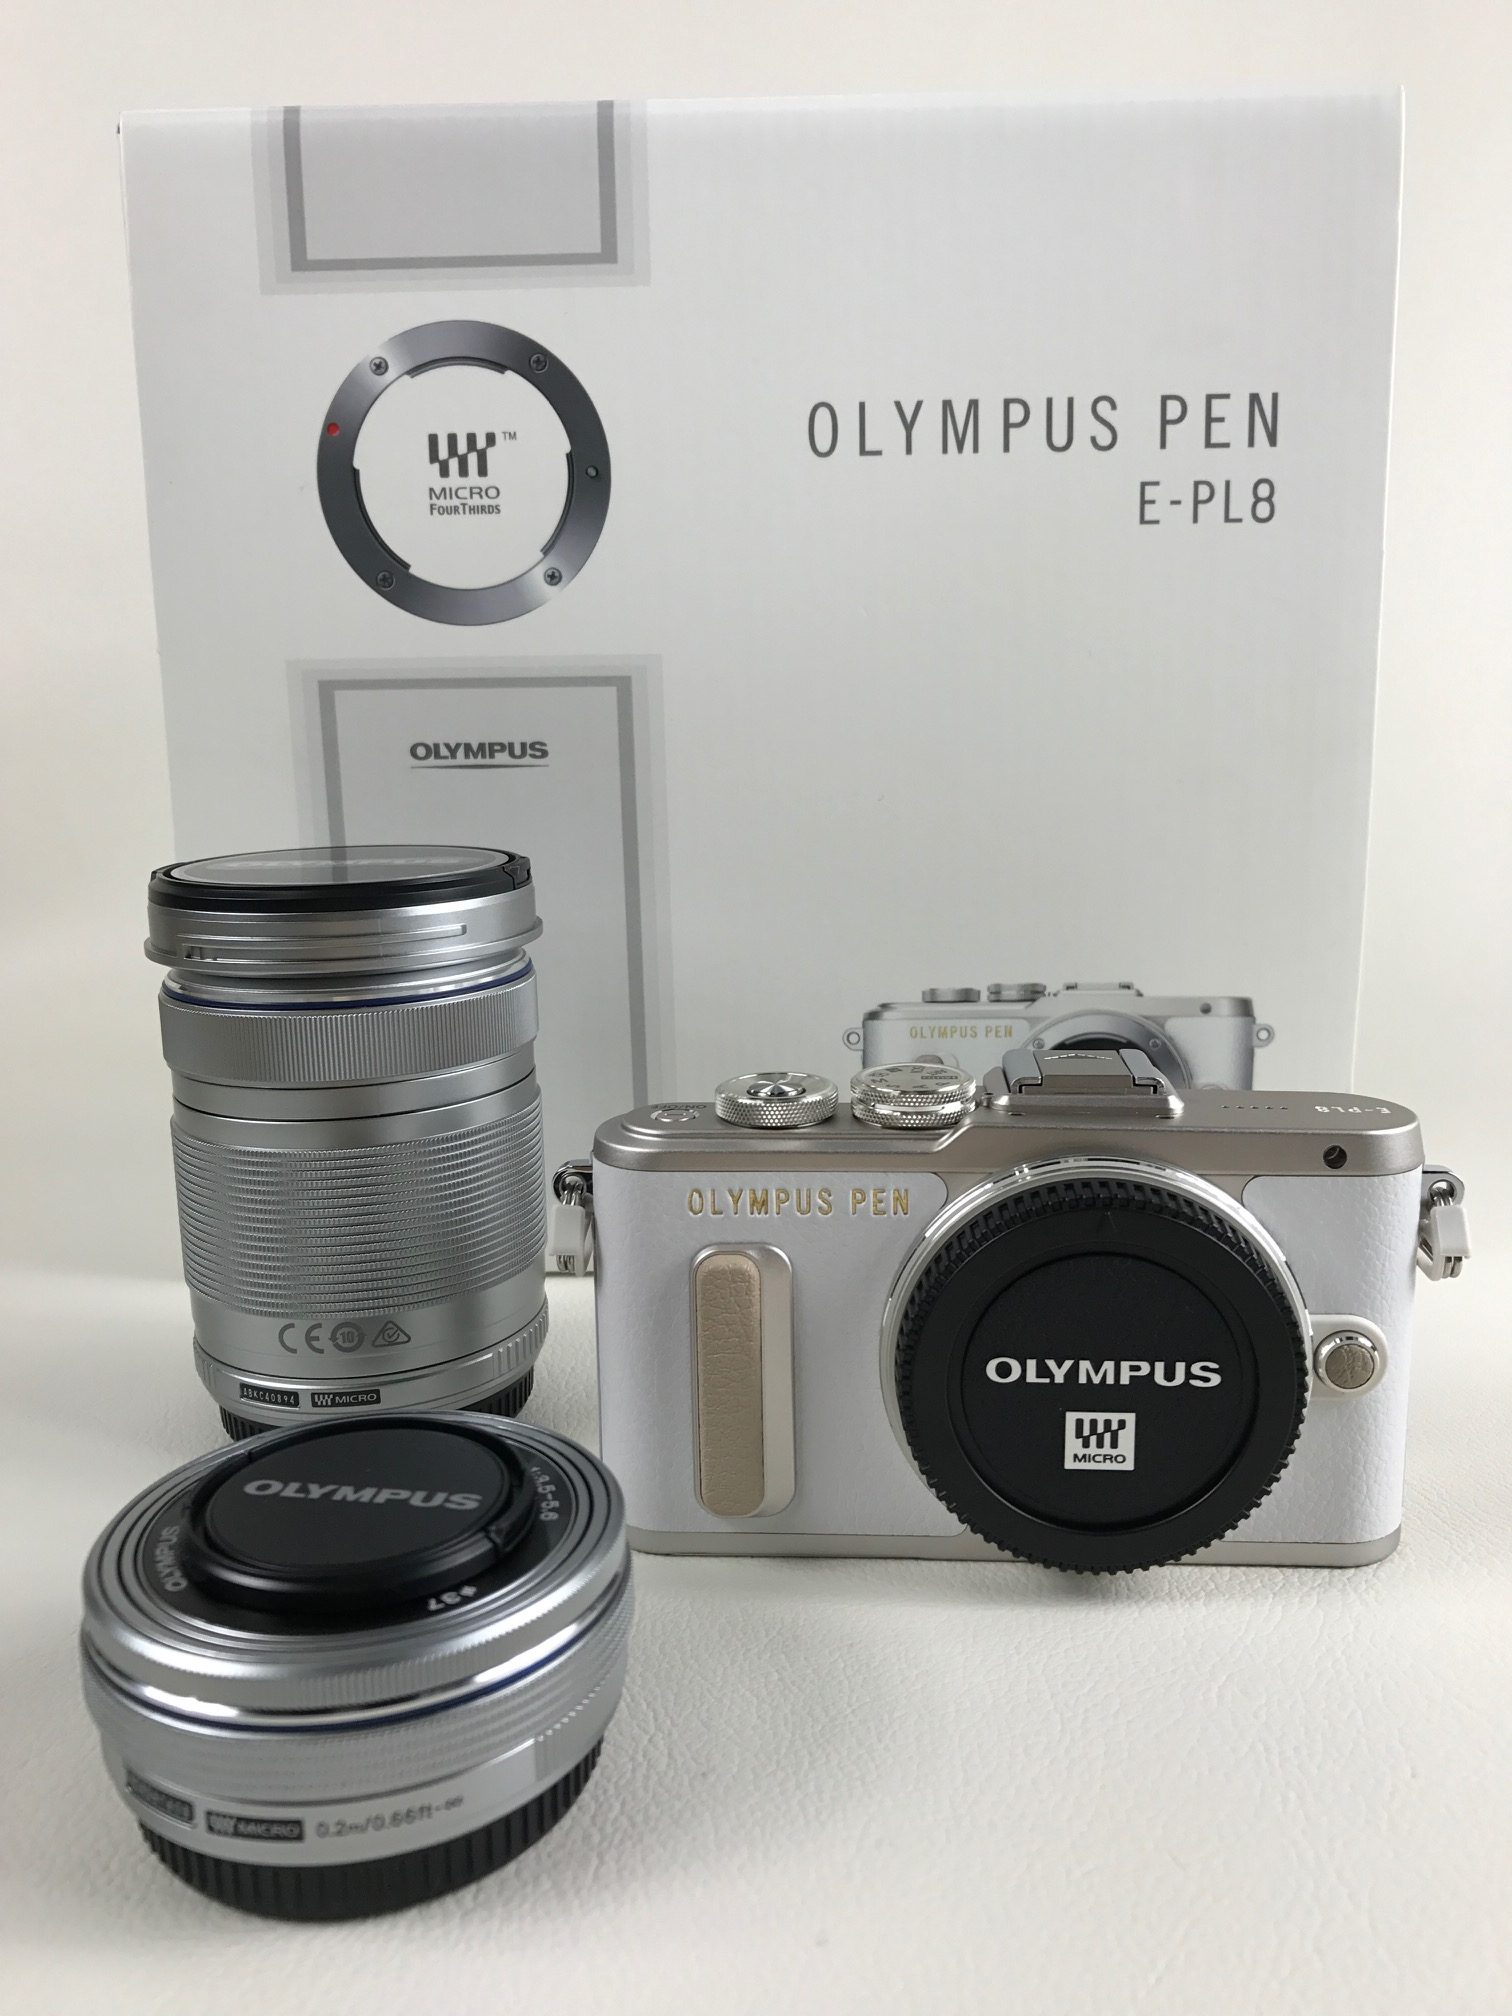 OLYMPUS PEN E-PL8 ミラーレス一眼 コンパクトカメラ ★買取 福井県越前市 サンステッププラス越前店